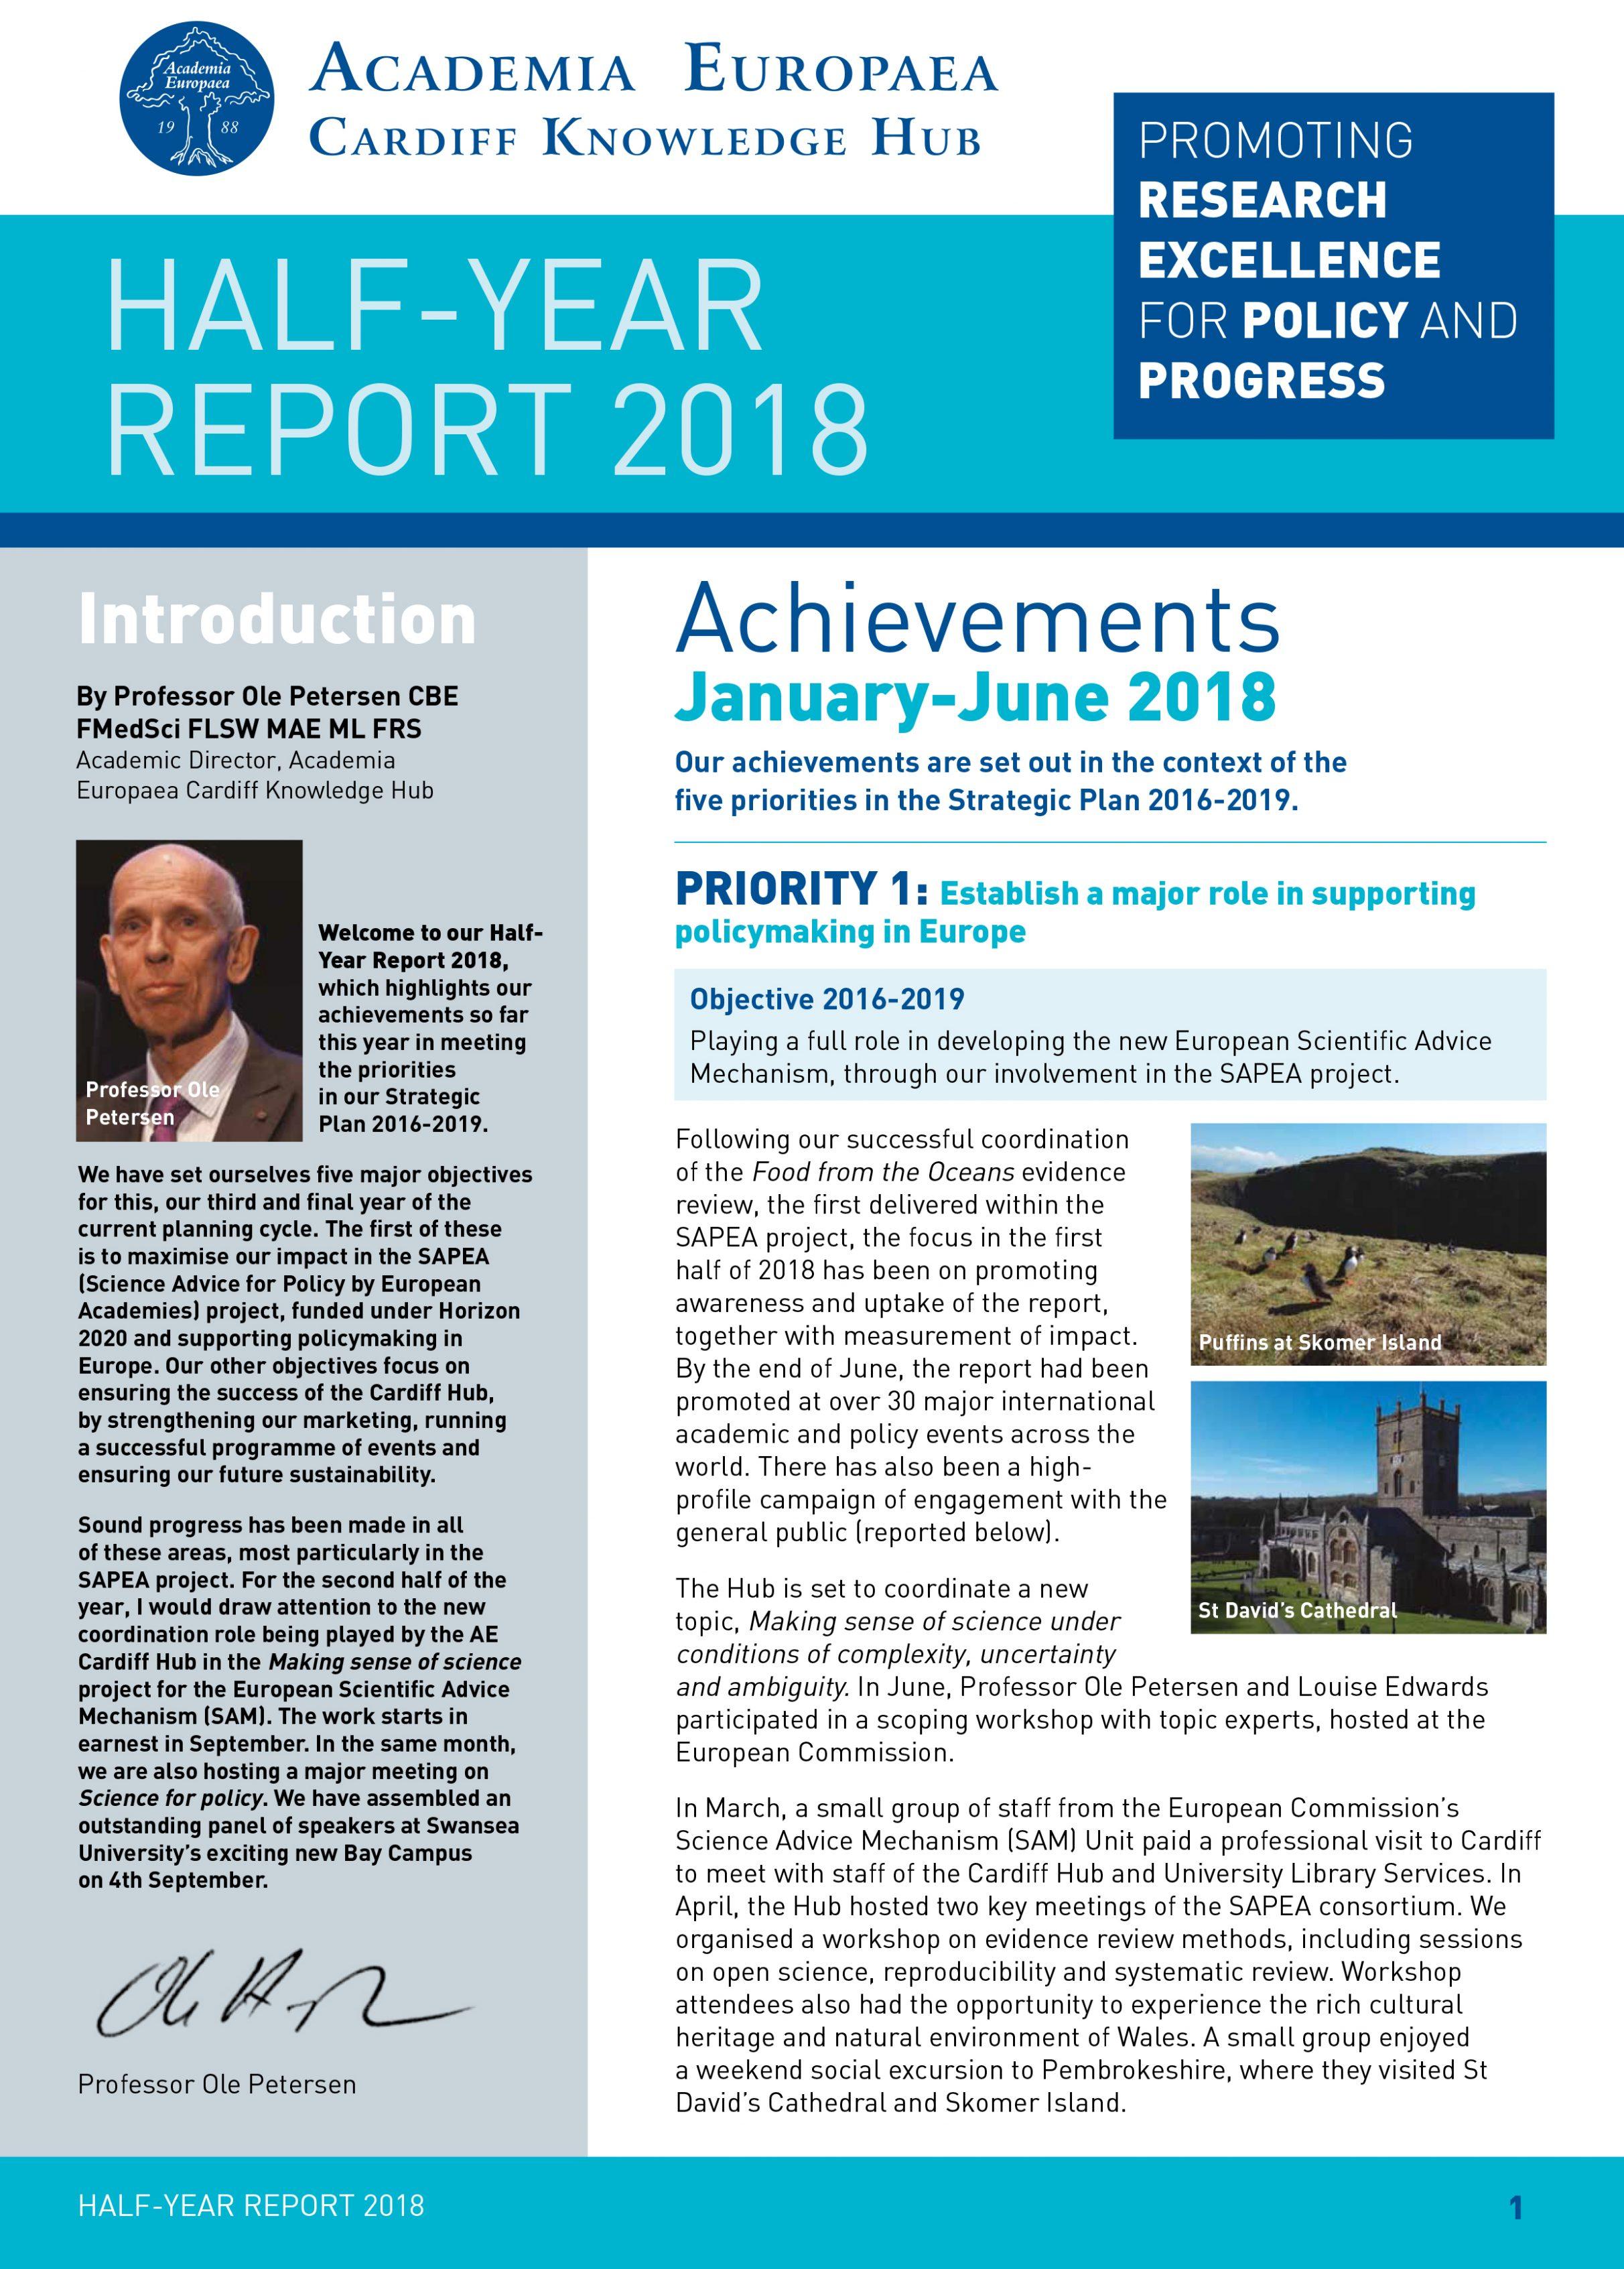 Half-Year report 2018